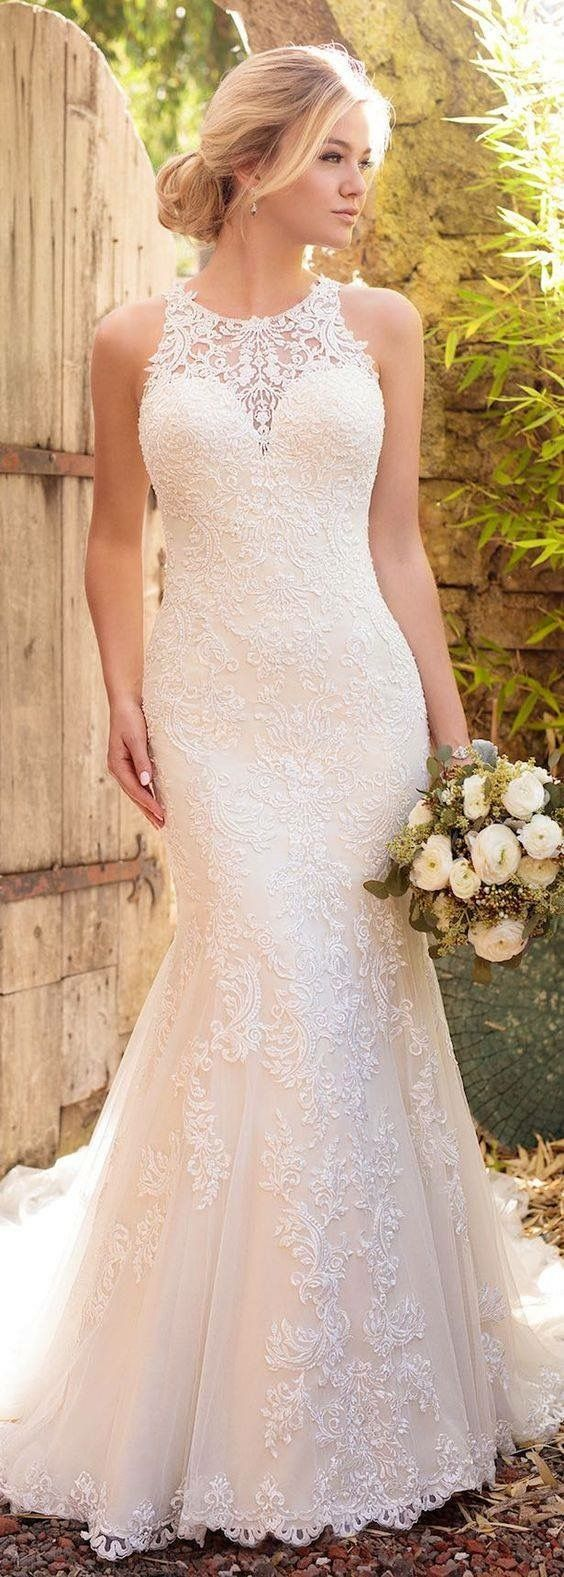 Lace wedding dress under 200 november 2018  best Wedding gown images on Pinterest  Wedding frocks Gown